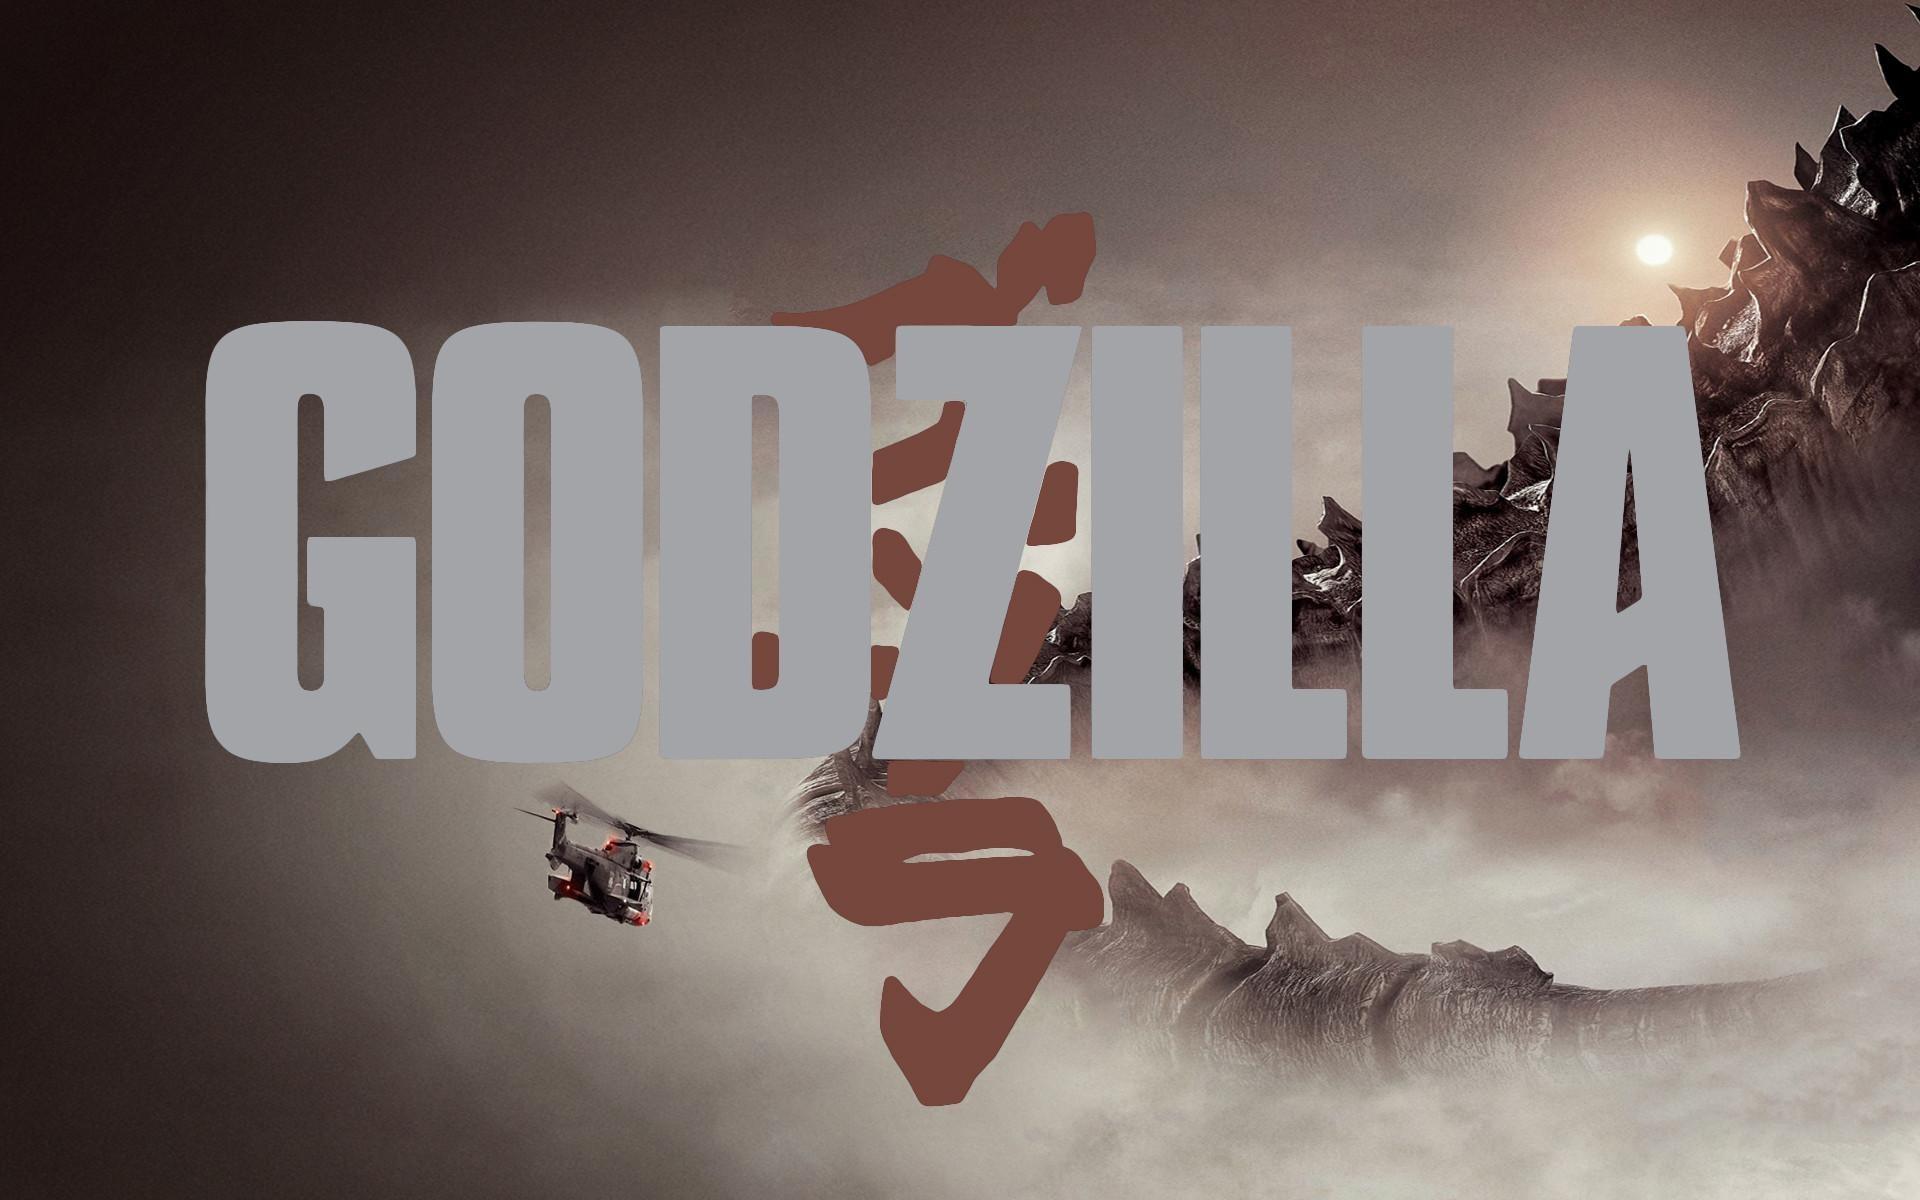 Free-Download-Godzilla-Wallpapers-HD